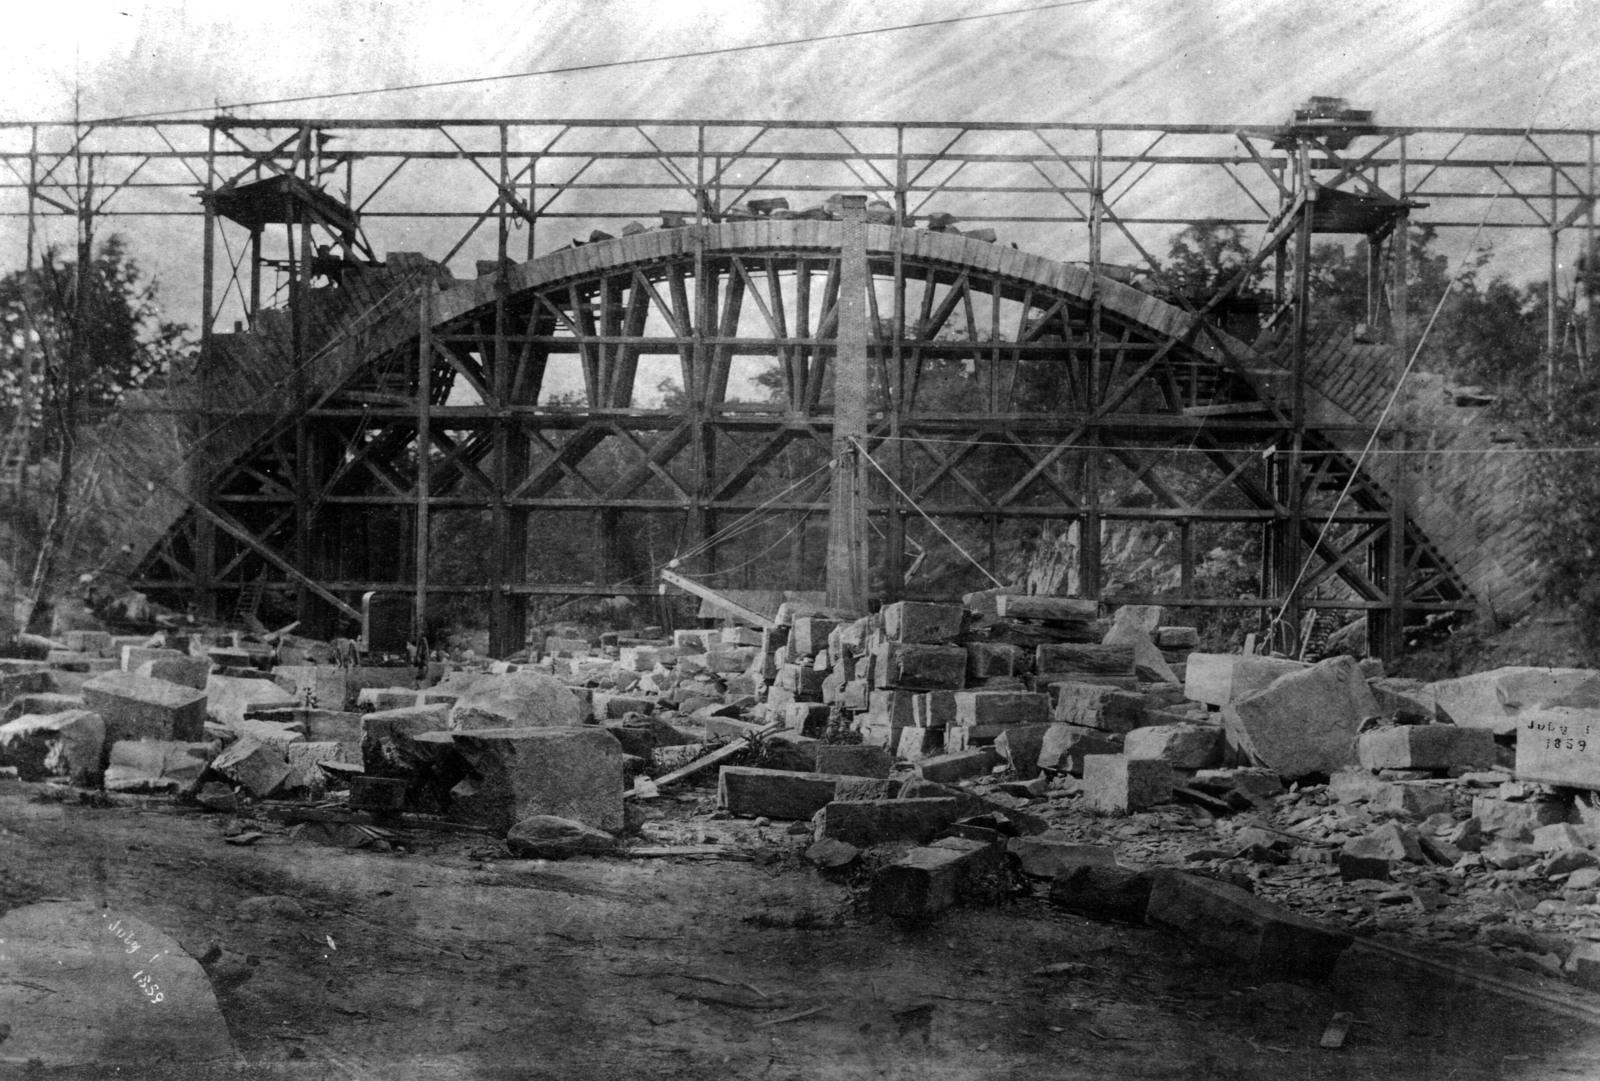 Photograph of the Construction of the Cabin John Bridge over Cabin John Creek, Originally Known as the Washington Aqueduct Bridge No. 4 in Maryland